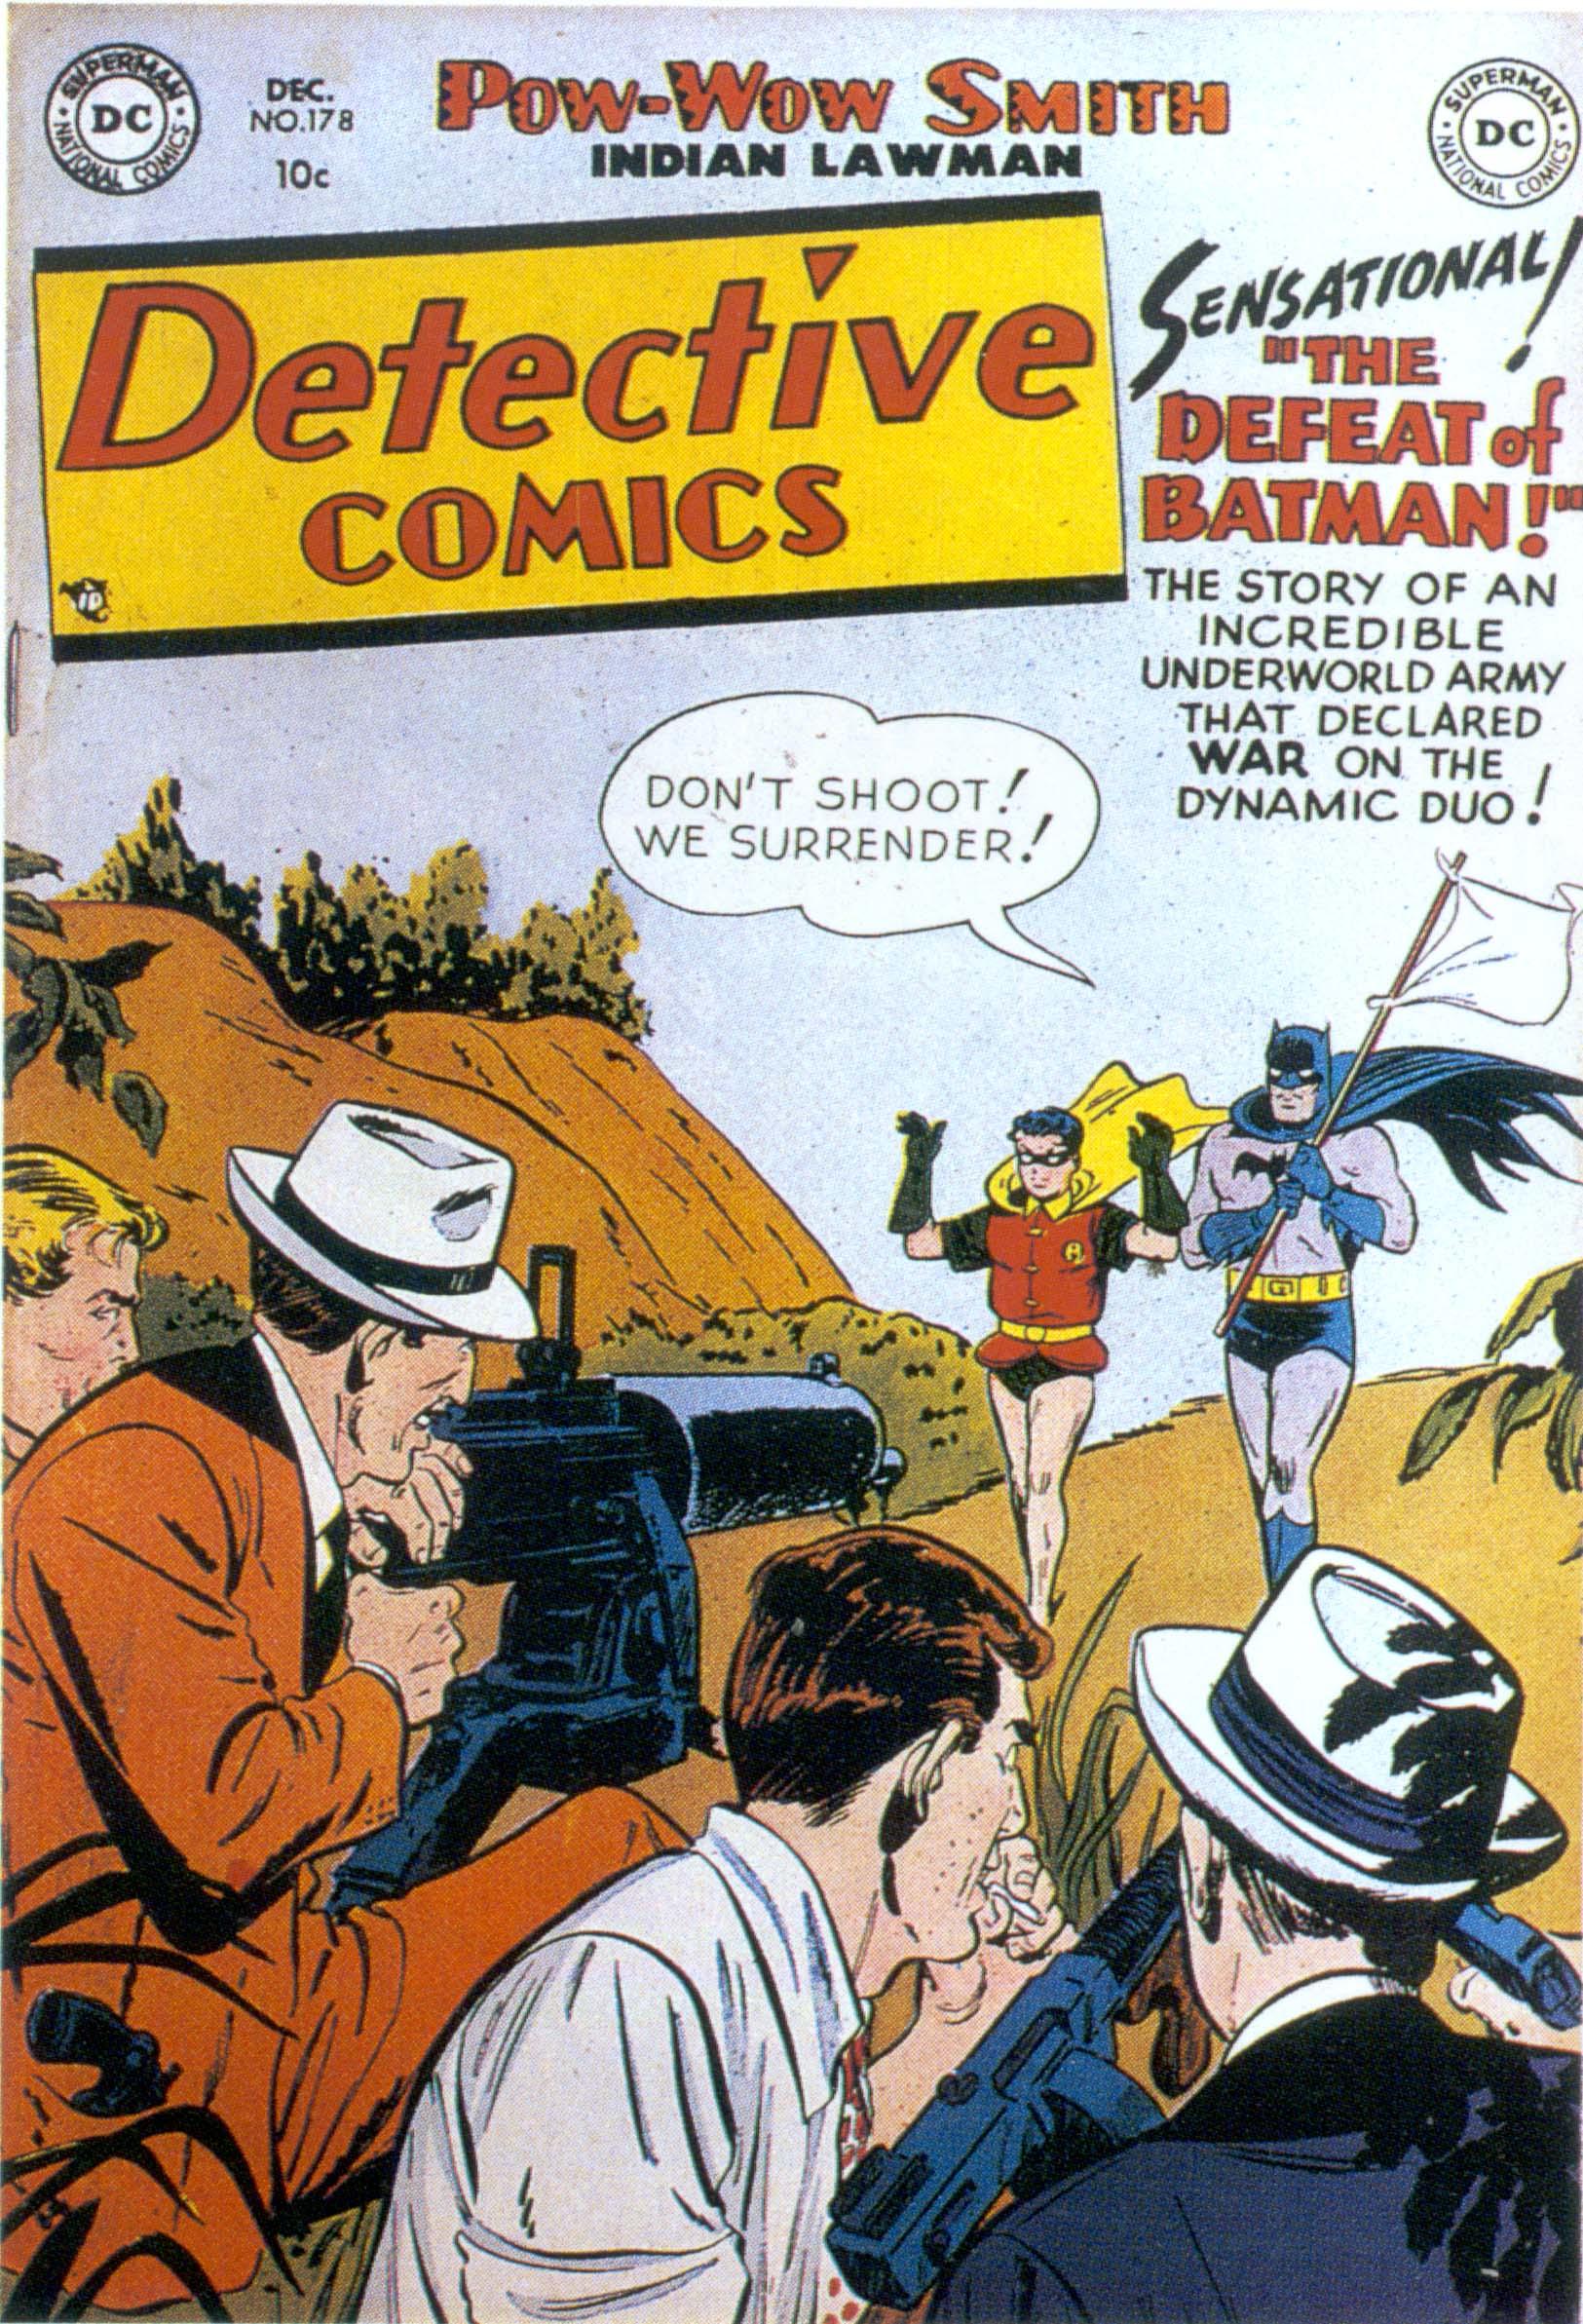 Read online Detective Comics (1937) comic -  Issue #178 - 1